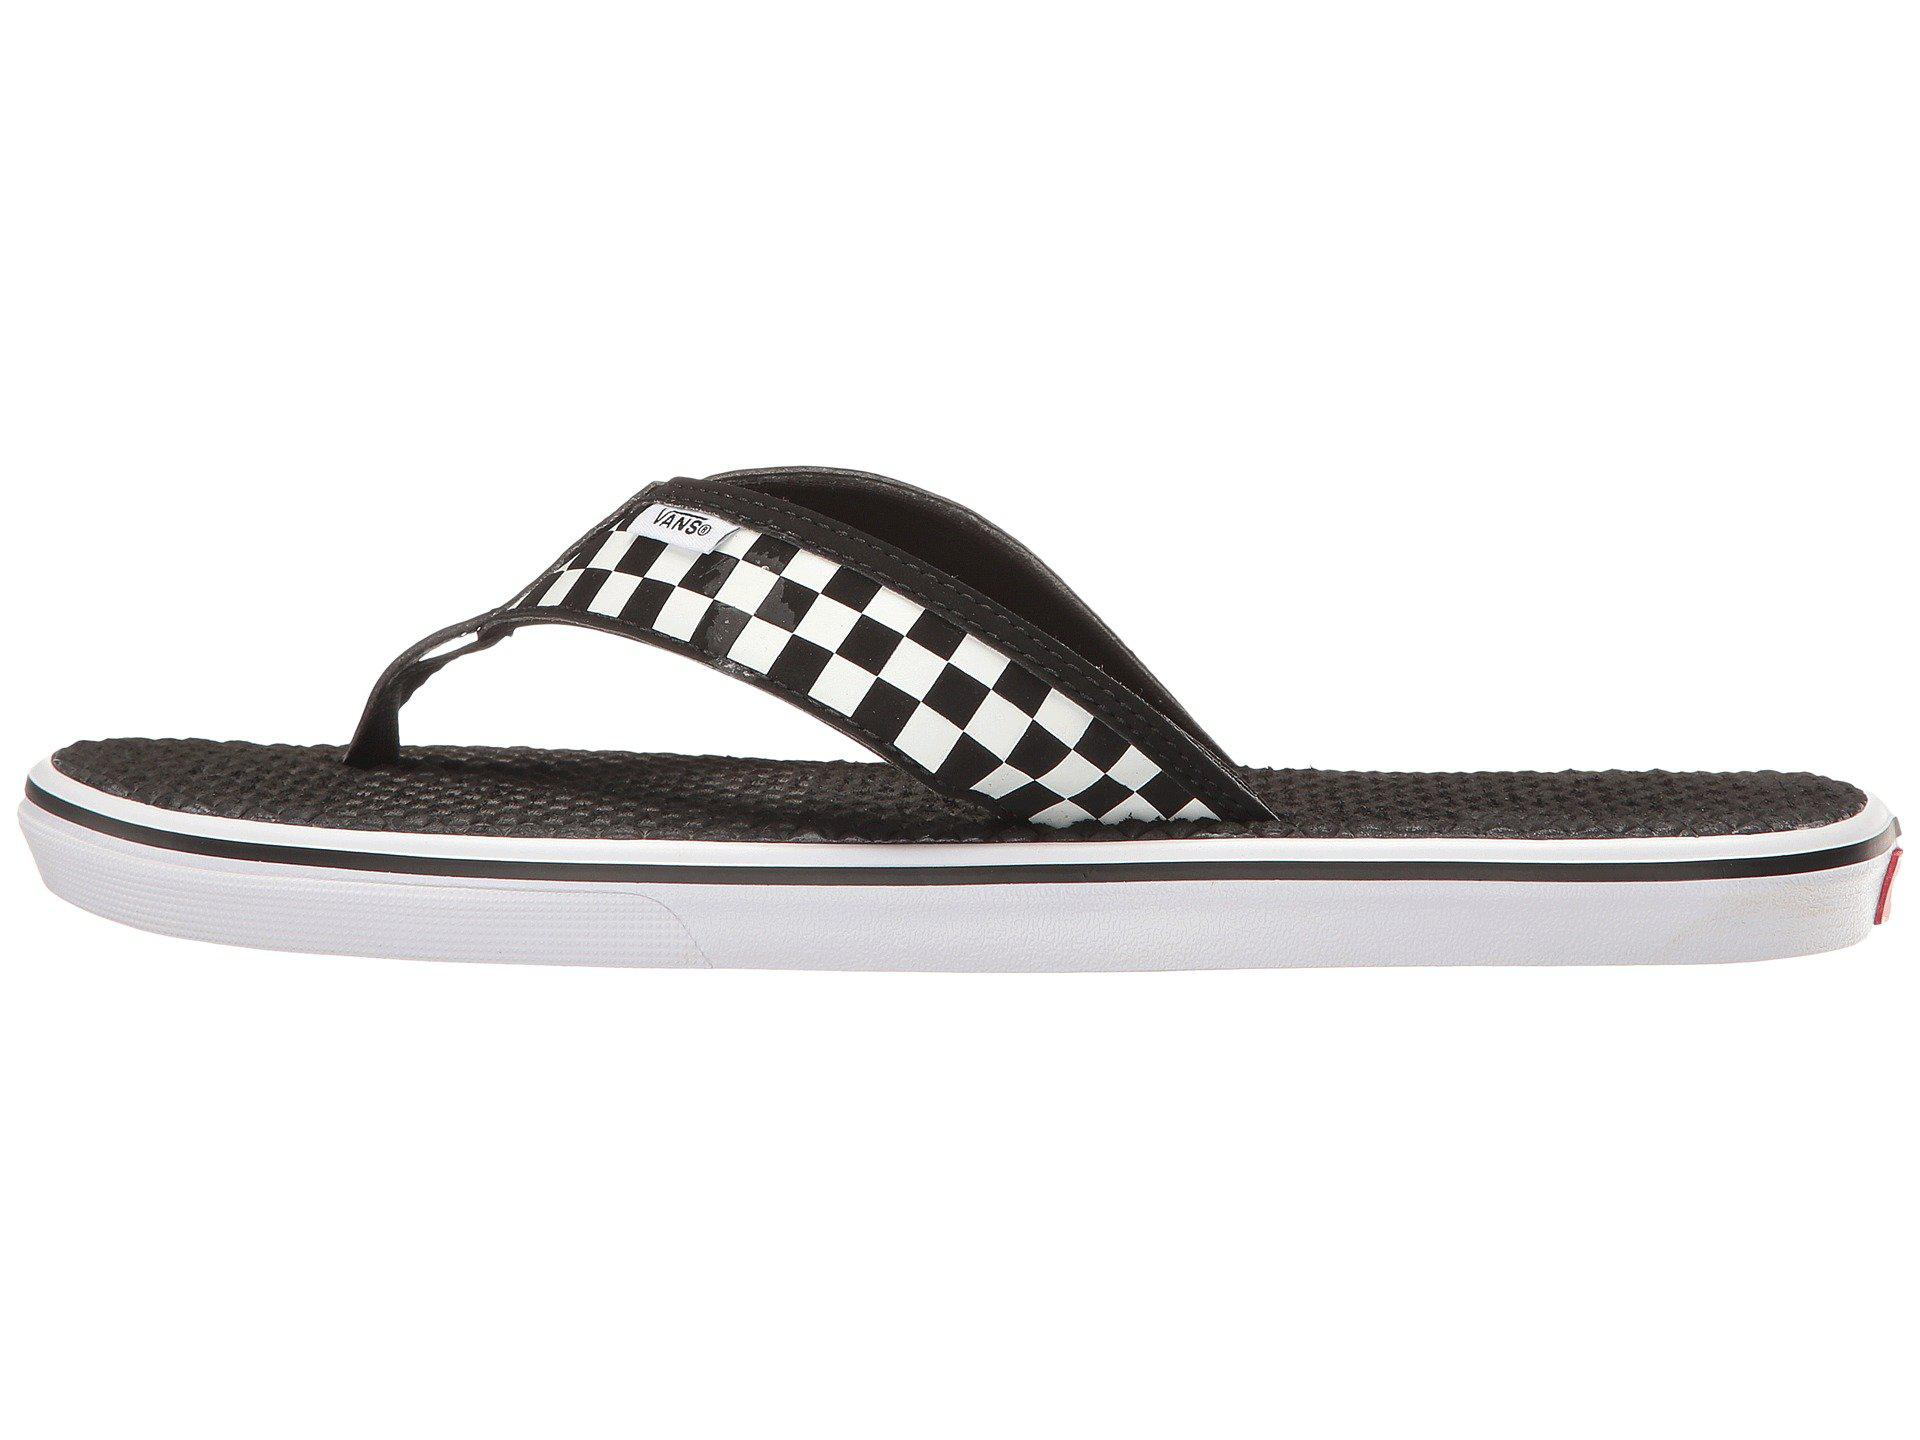 7bb18b5dd1 Lyst - Vans La Costa Lite ((checkerboard) Black white) Men s Sandals in  Black for Men